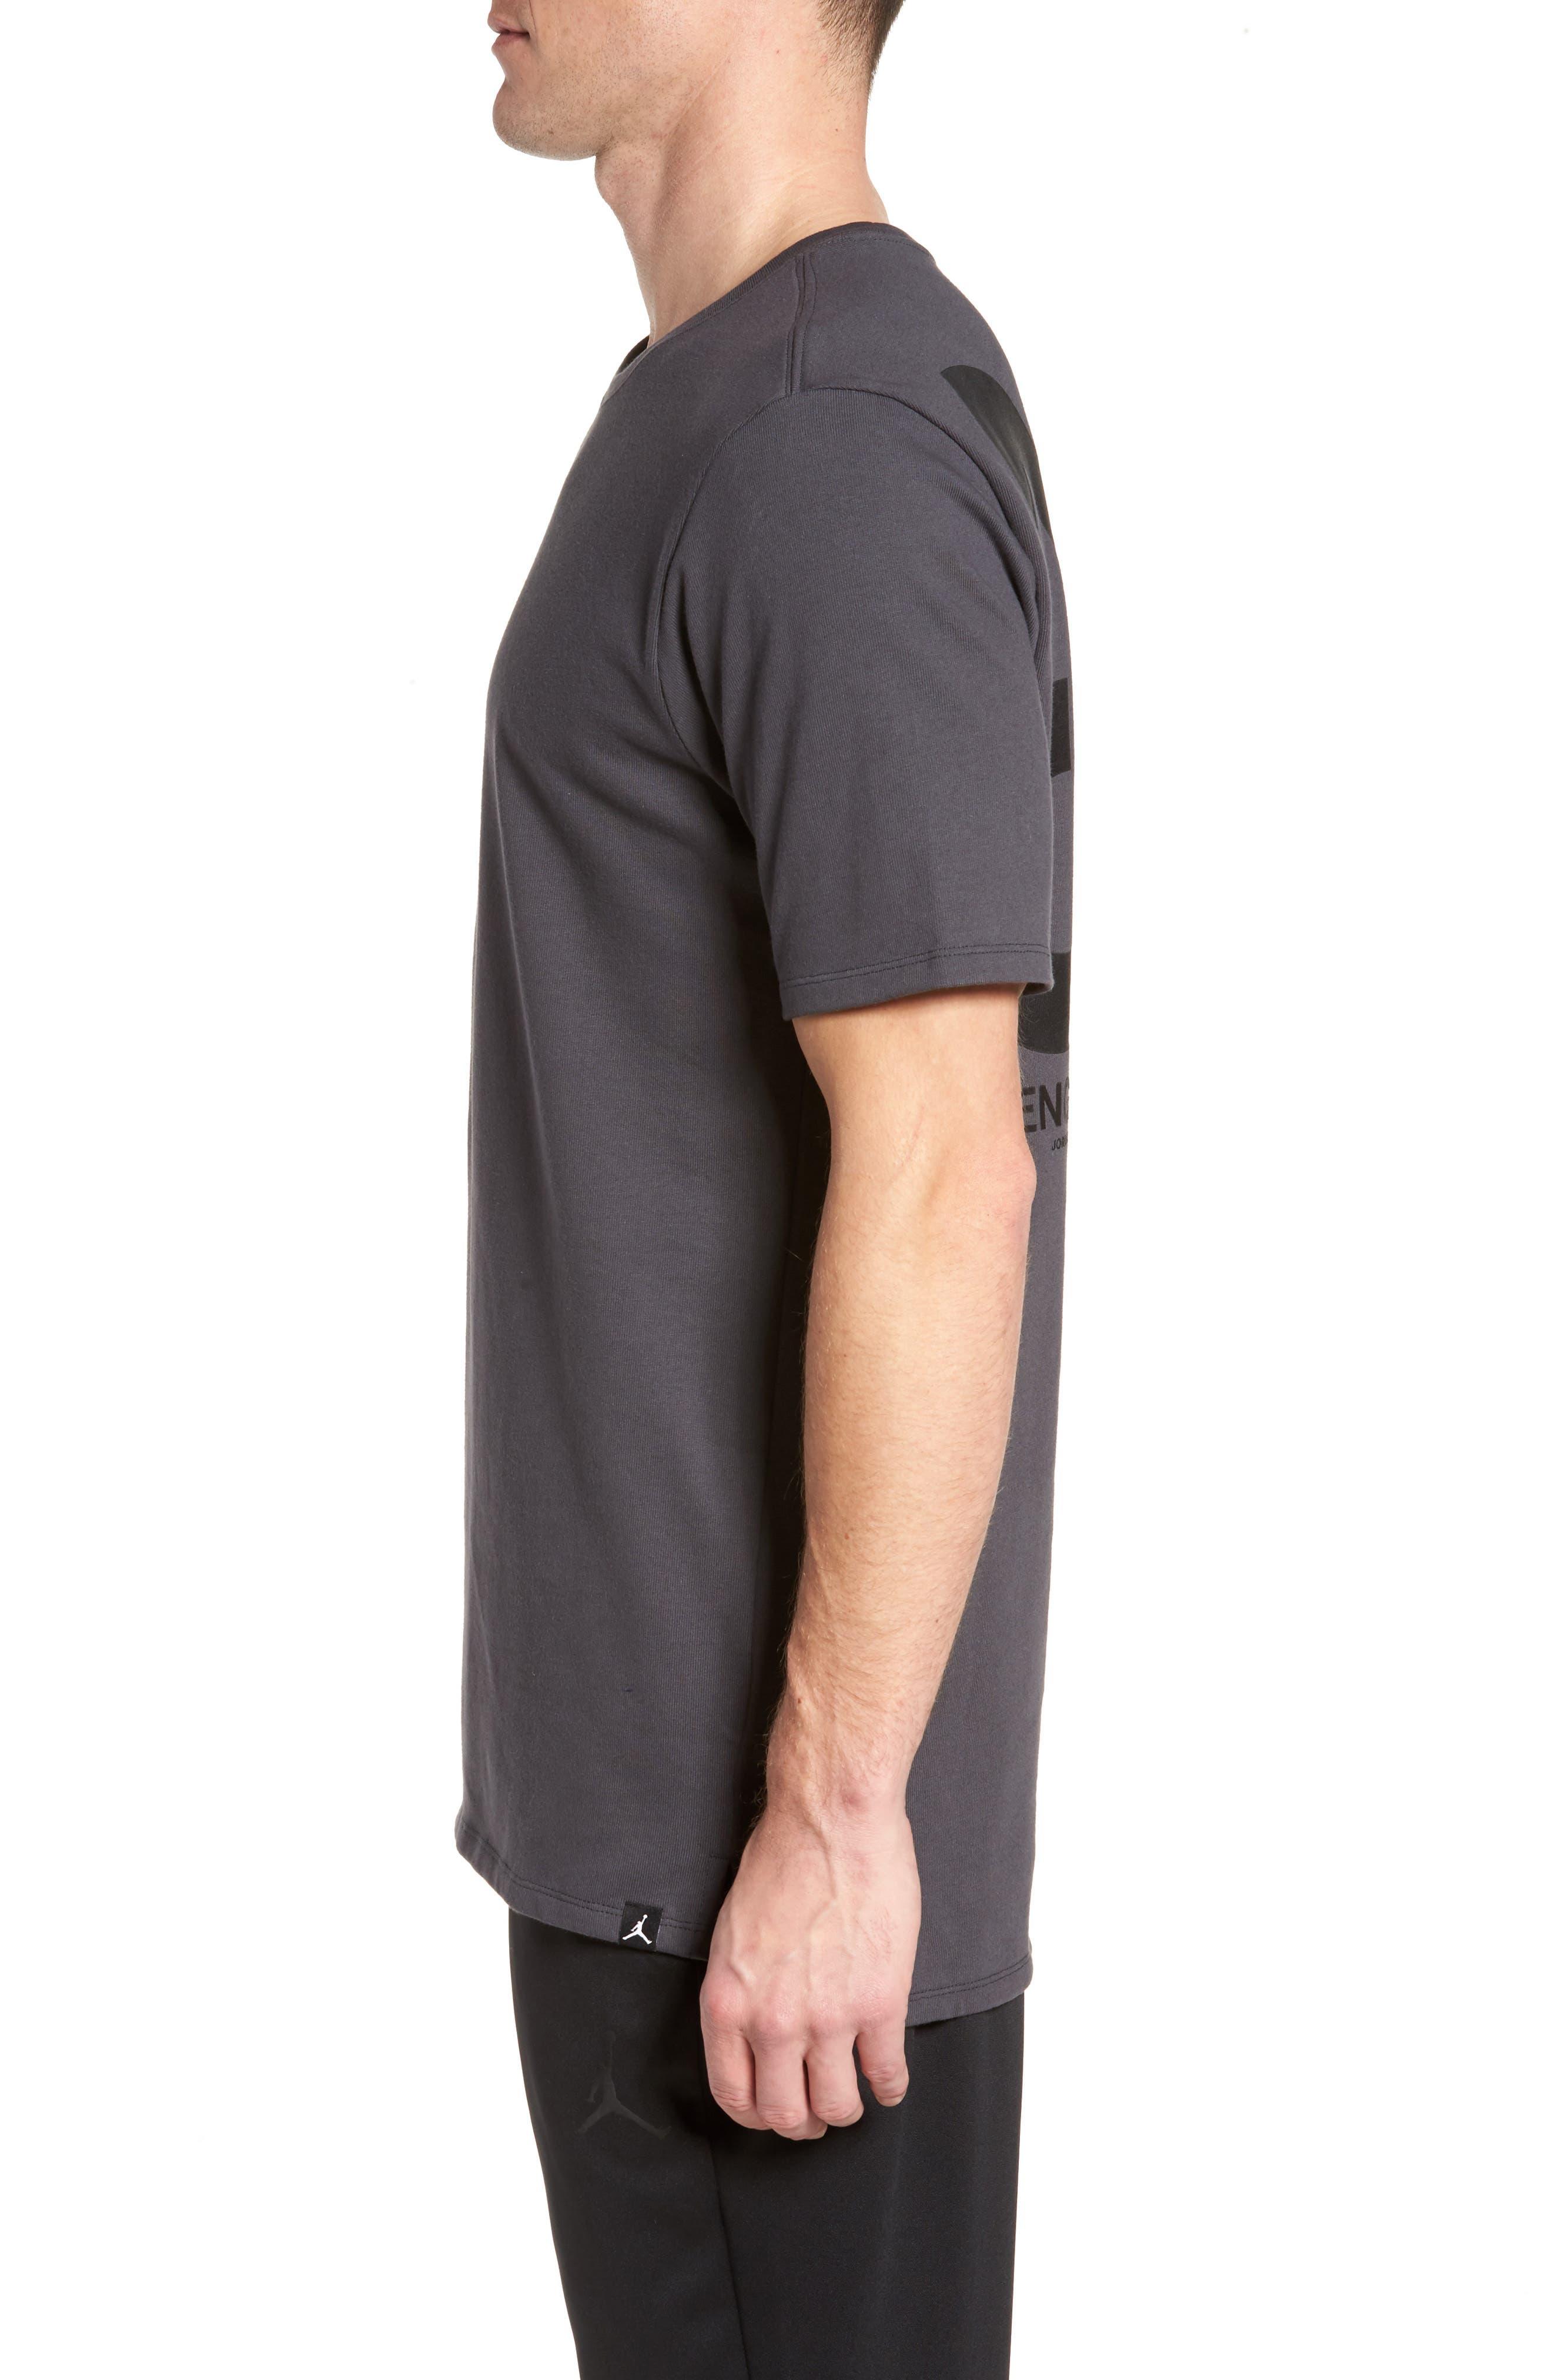 Sportswear 23 Engineered T-Shirt,                             Alternate thumbnail 3, color,                             Anthracite/ Black